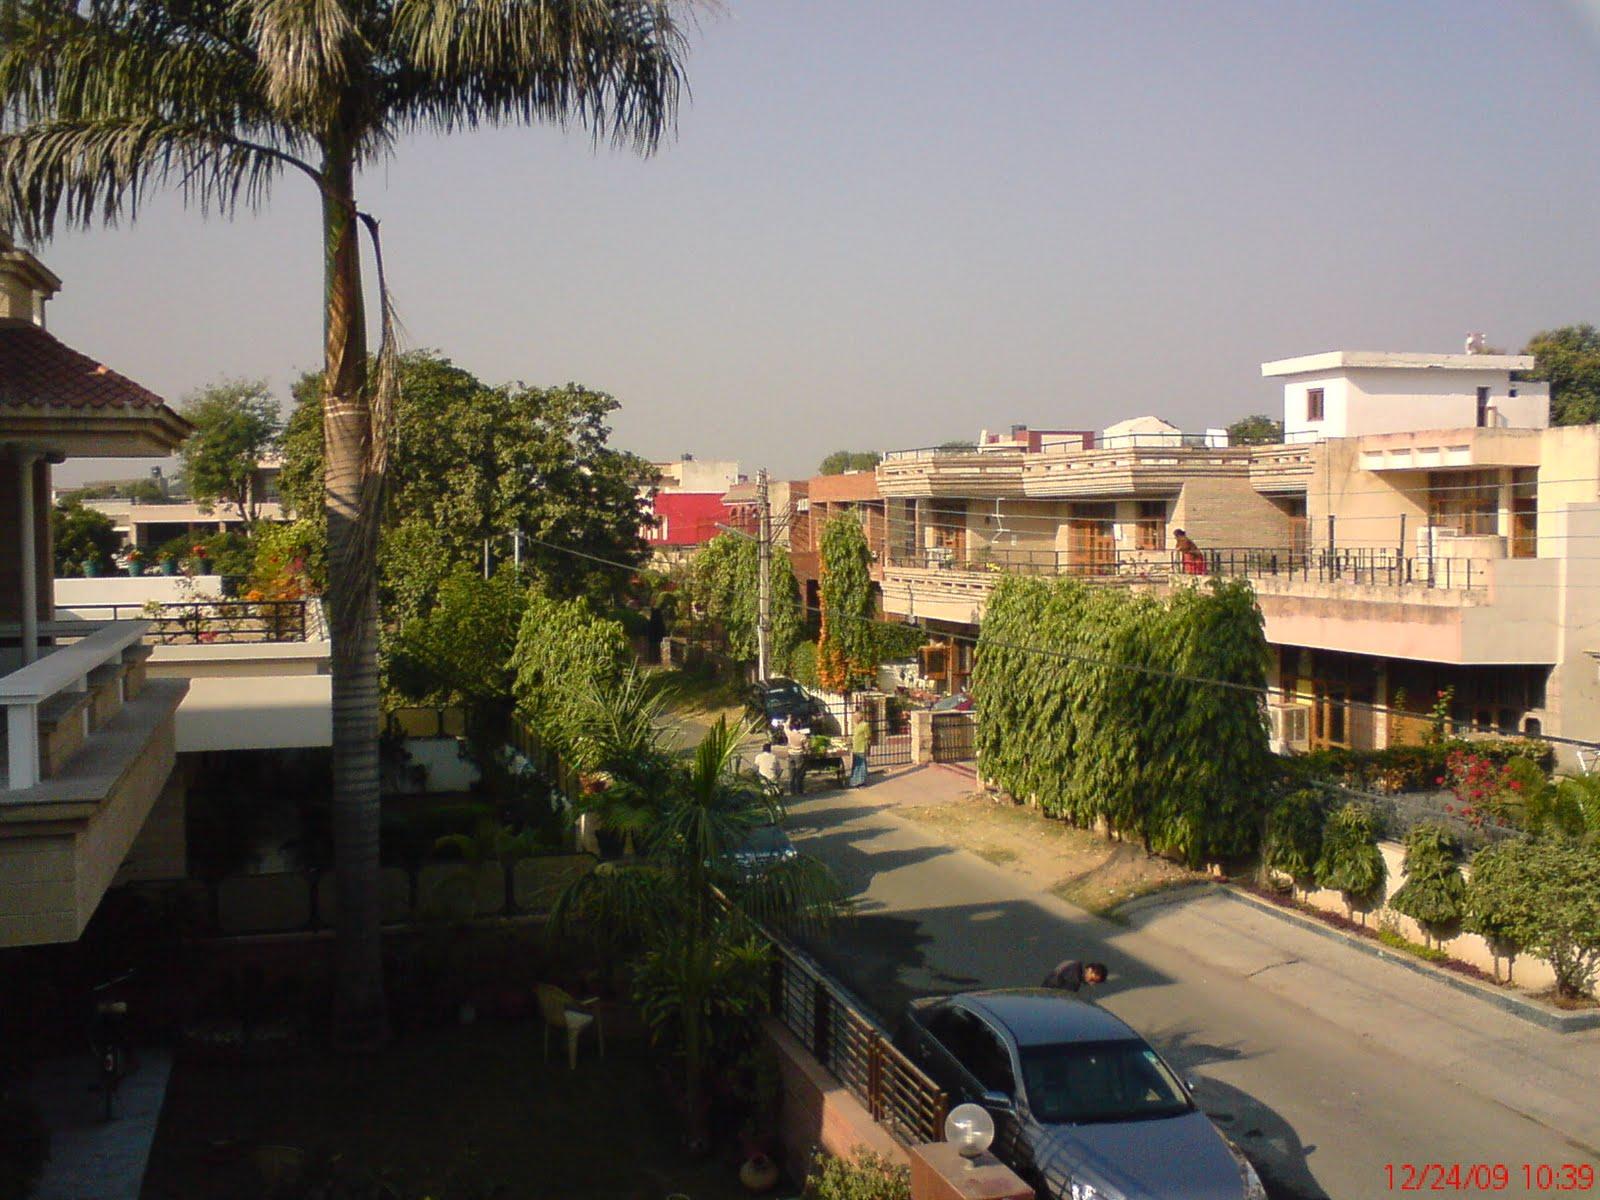 Panchkula India  city images : Panchkula sector 17 Wikipedia, the free encyclopedia